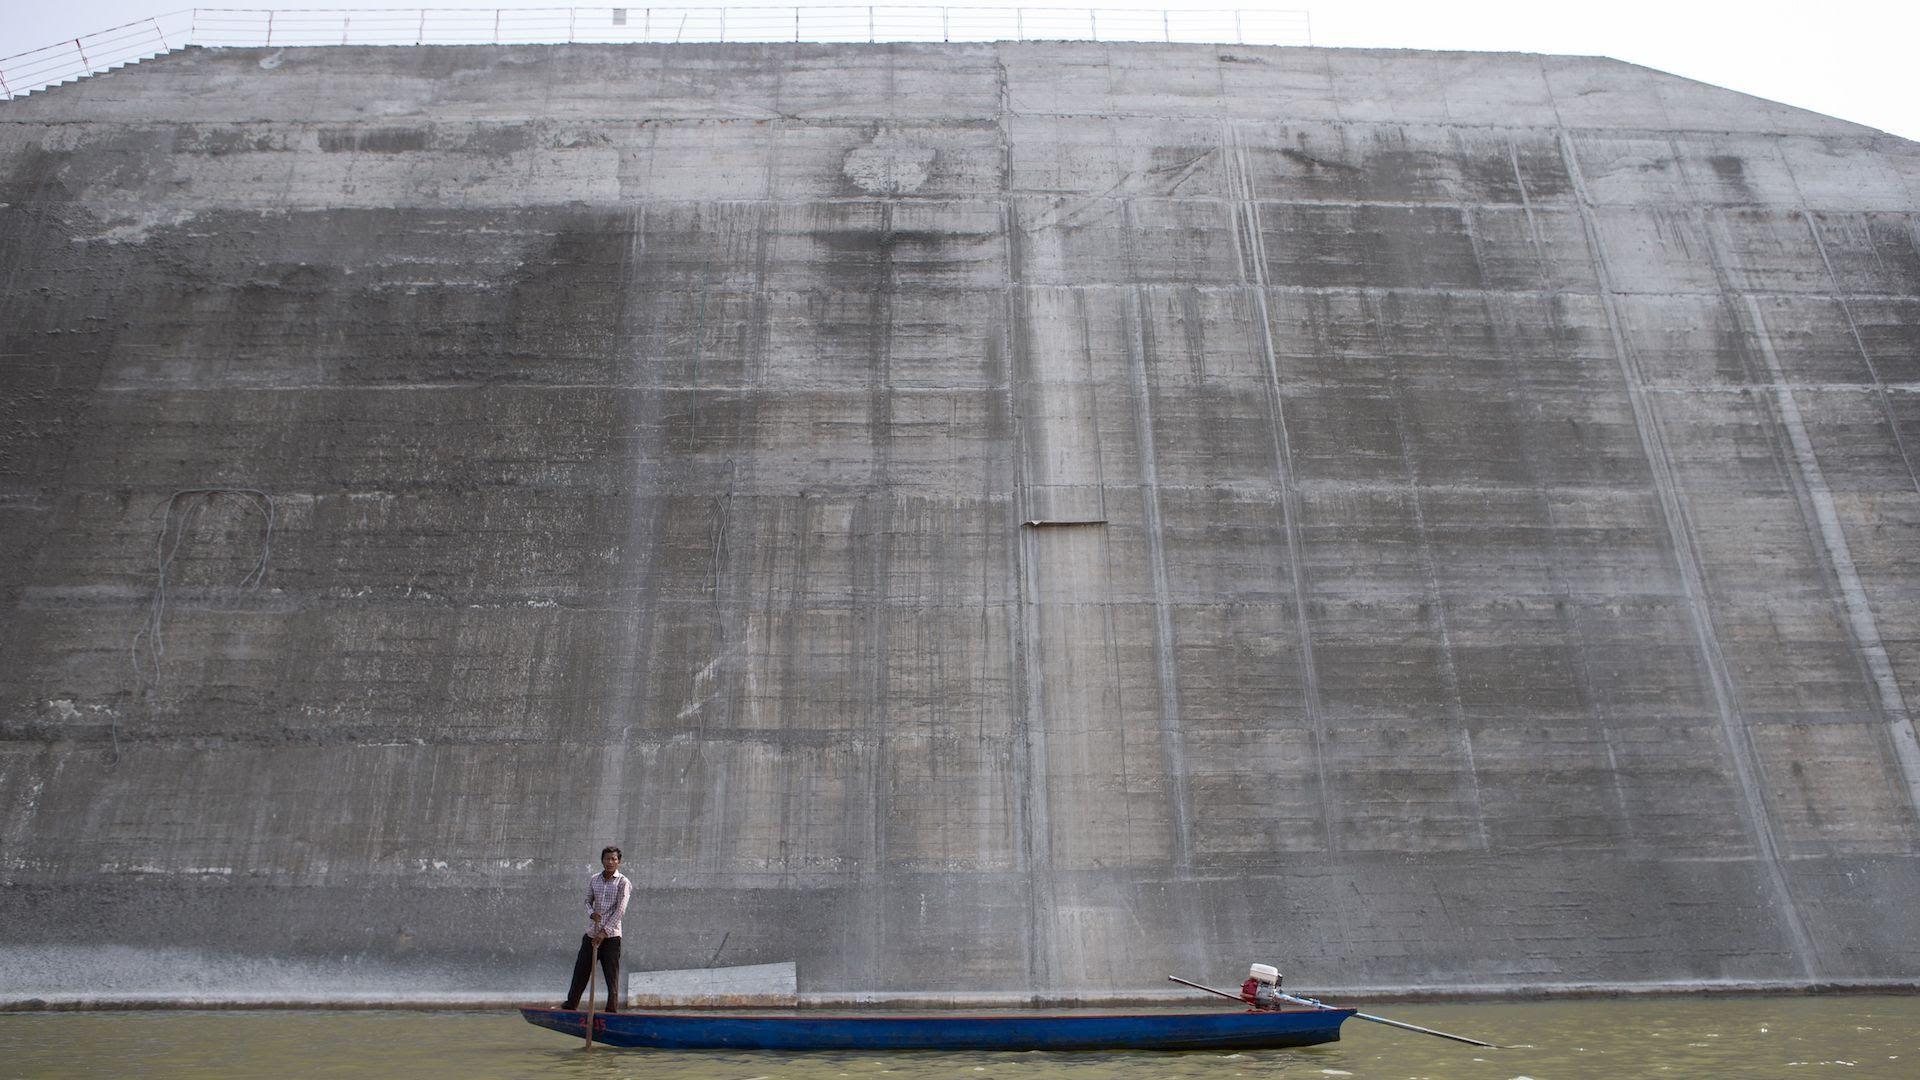 The Sesan 2 dam in Stung Treng, Cambodia